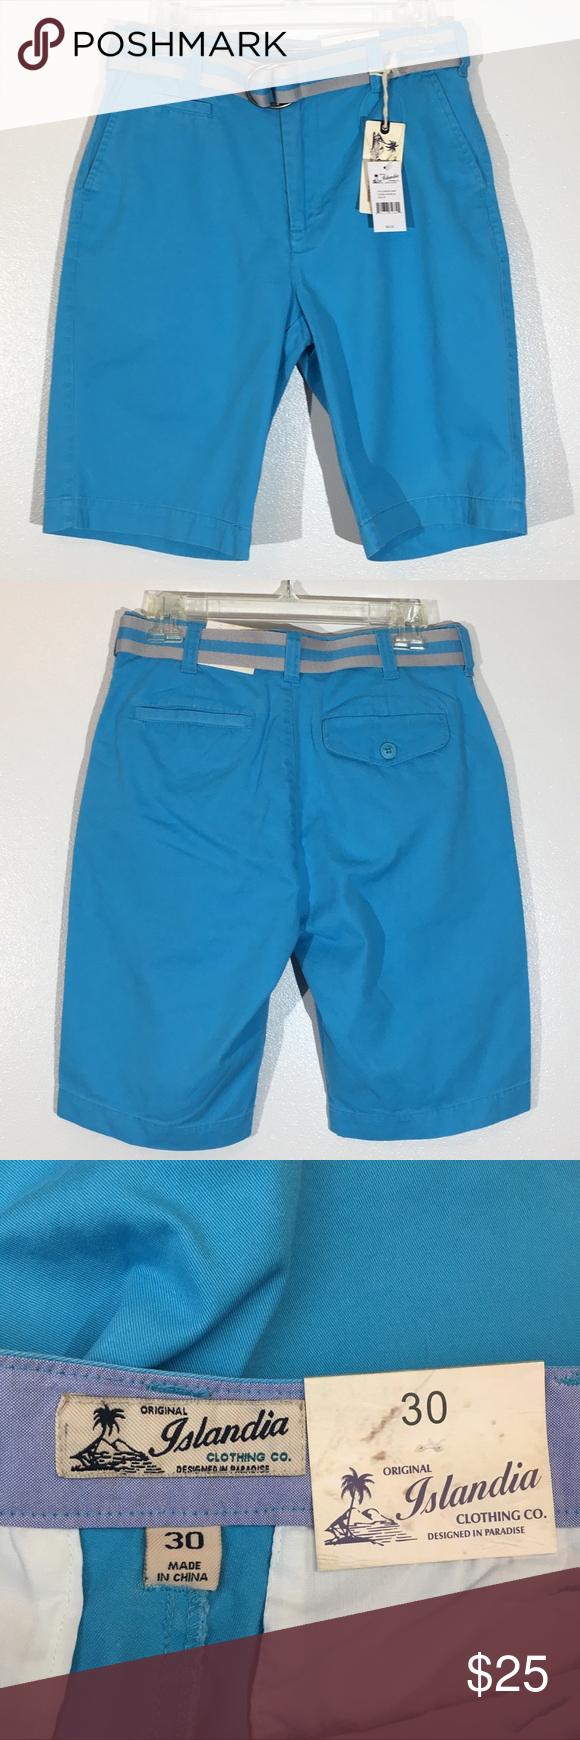 "Islandia light blue flat front shorts w/belt - 30 Brand new with tags Flat from light blue shorts with and attached adjustable/removable belt  Waist 15"" Inseam 10.5"" Out seam 21.5"" Islandia Shorts Flat Front #lightblueshorts Islandia light blue flat front shorts w/belt - 30 Brand new with tags Flat from light blue shorts with and attached adjustable/removable belt  Waist 15"" Inseam 10.5"" Out seam 21.5"" Islandia Shorts Flat Front #lightblueshorts"